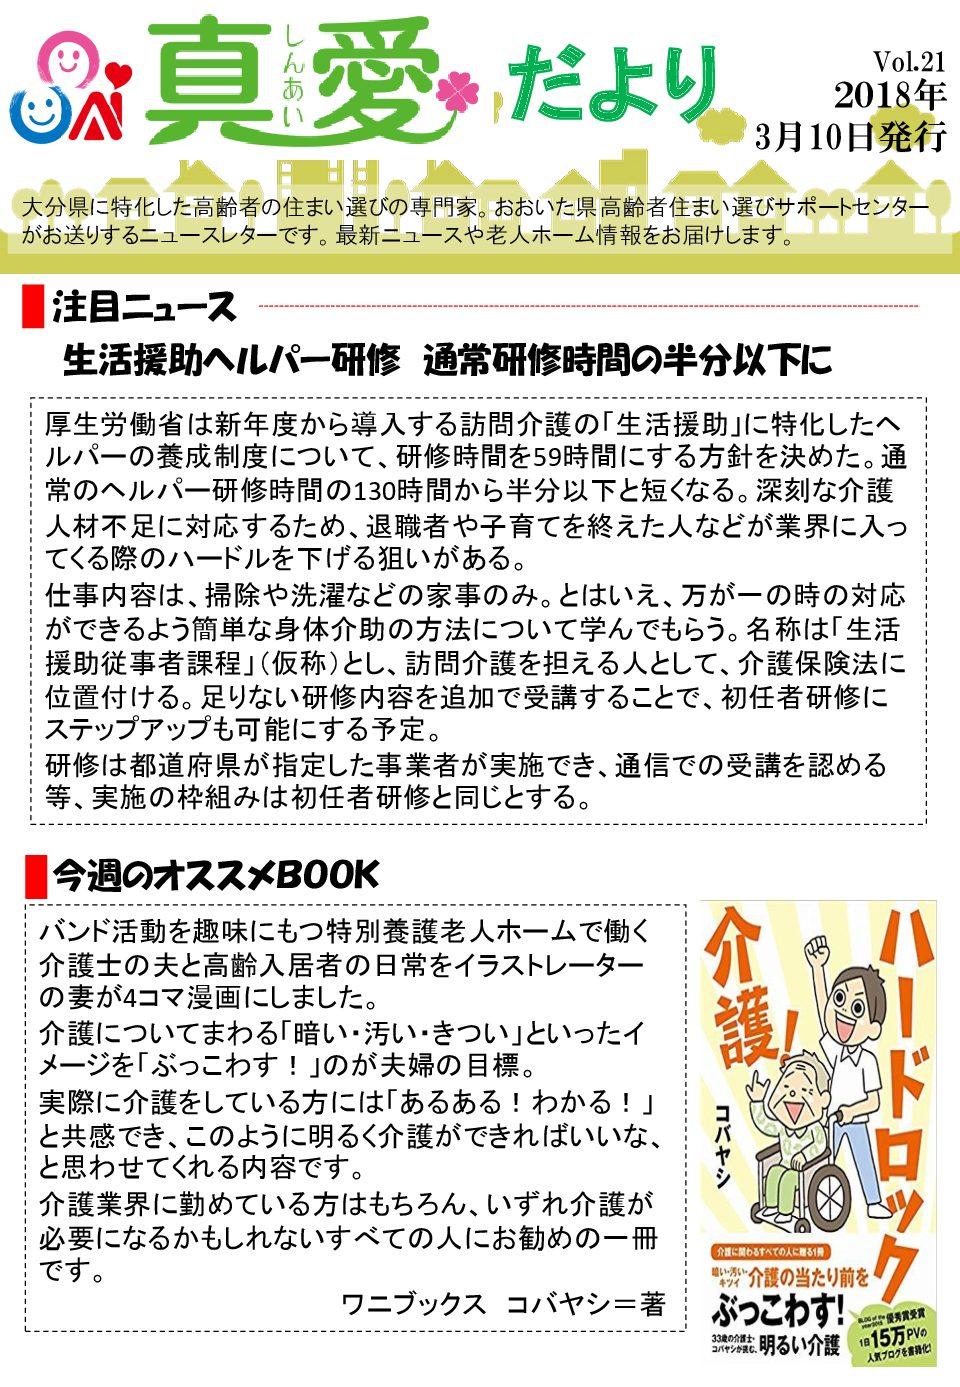 【Vol.21】 2018.03.10発行